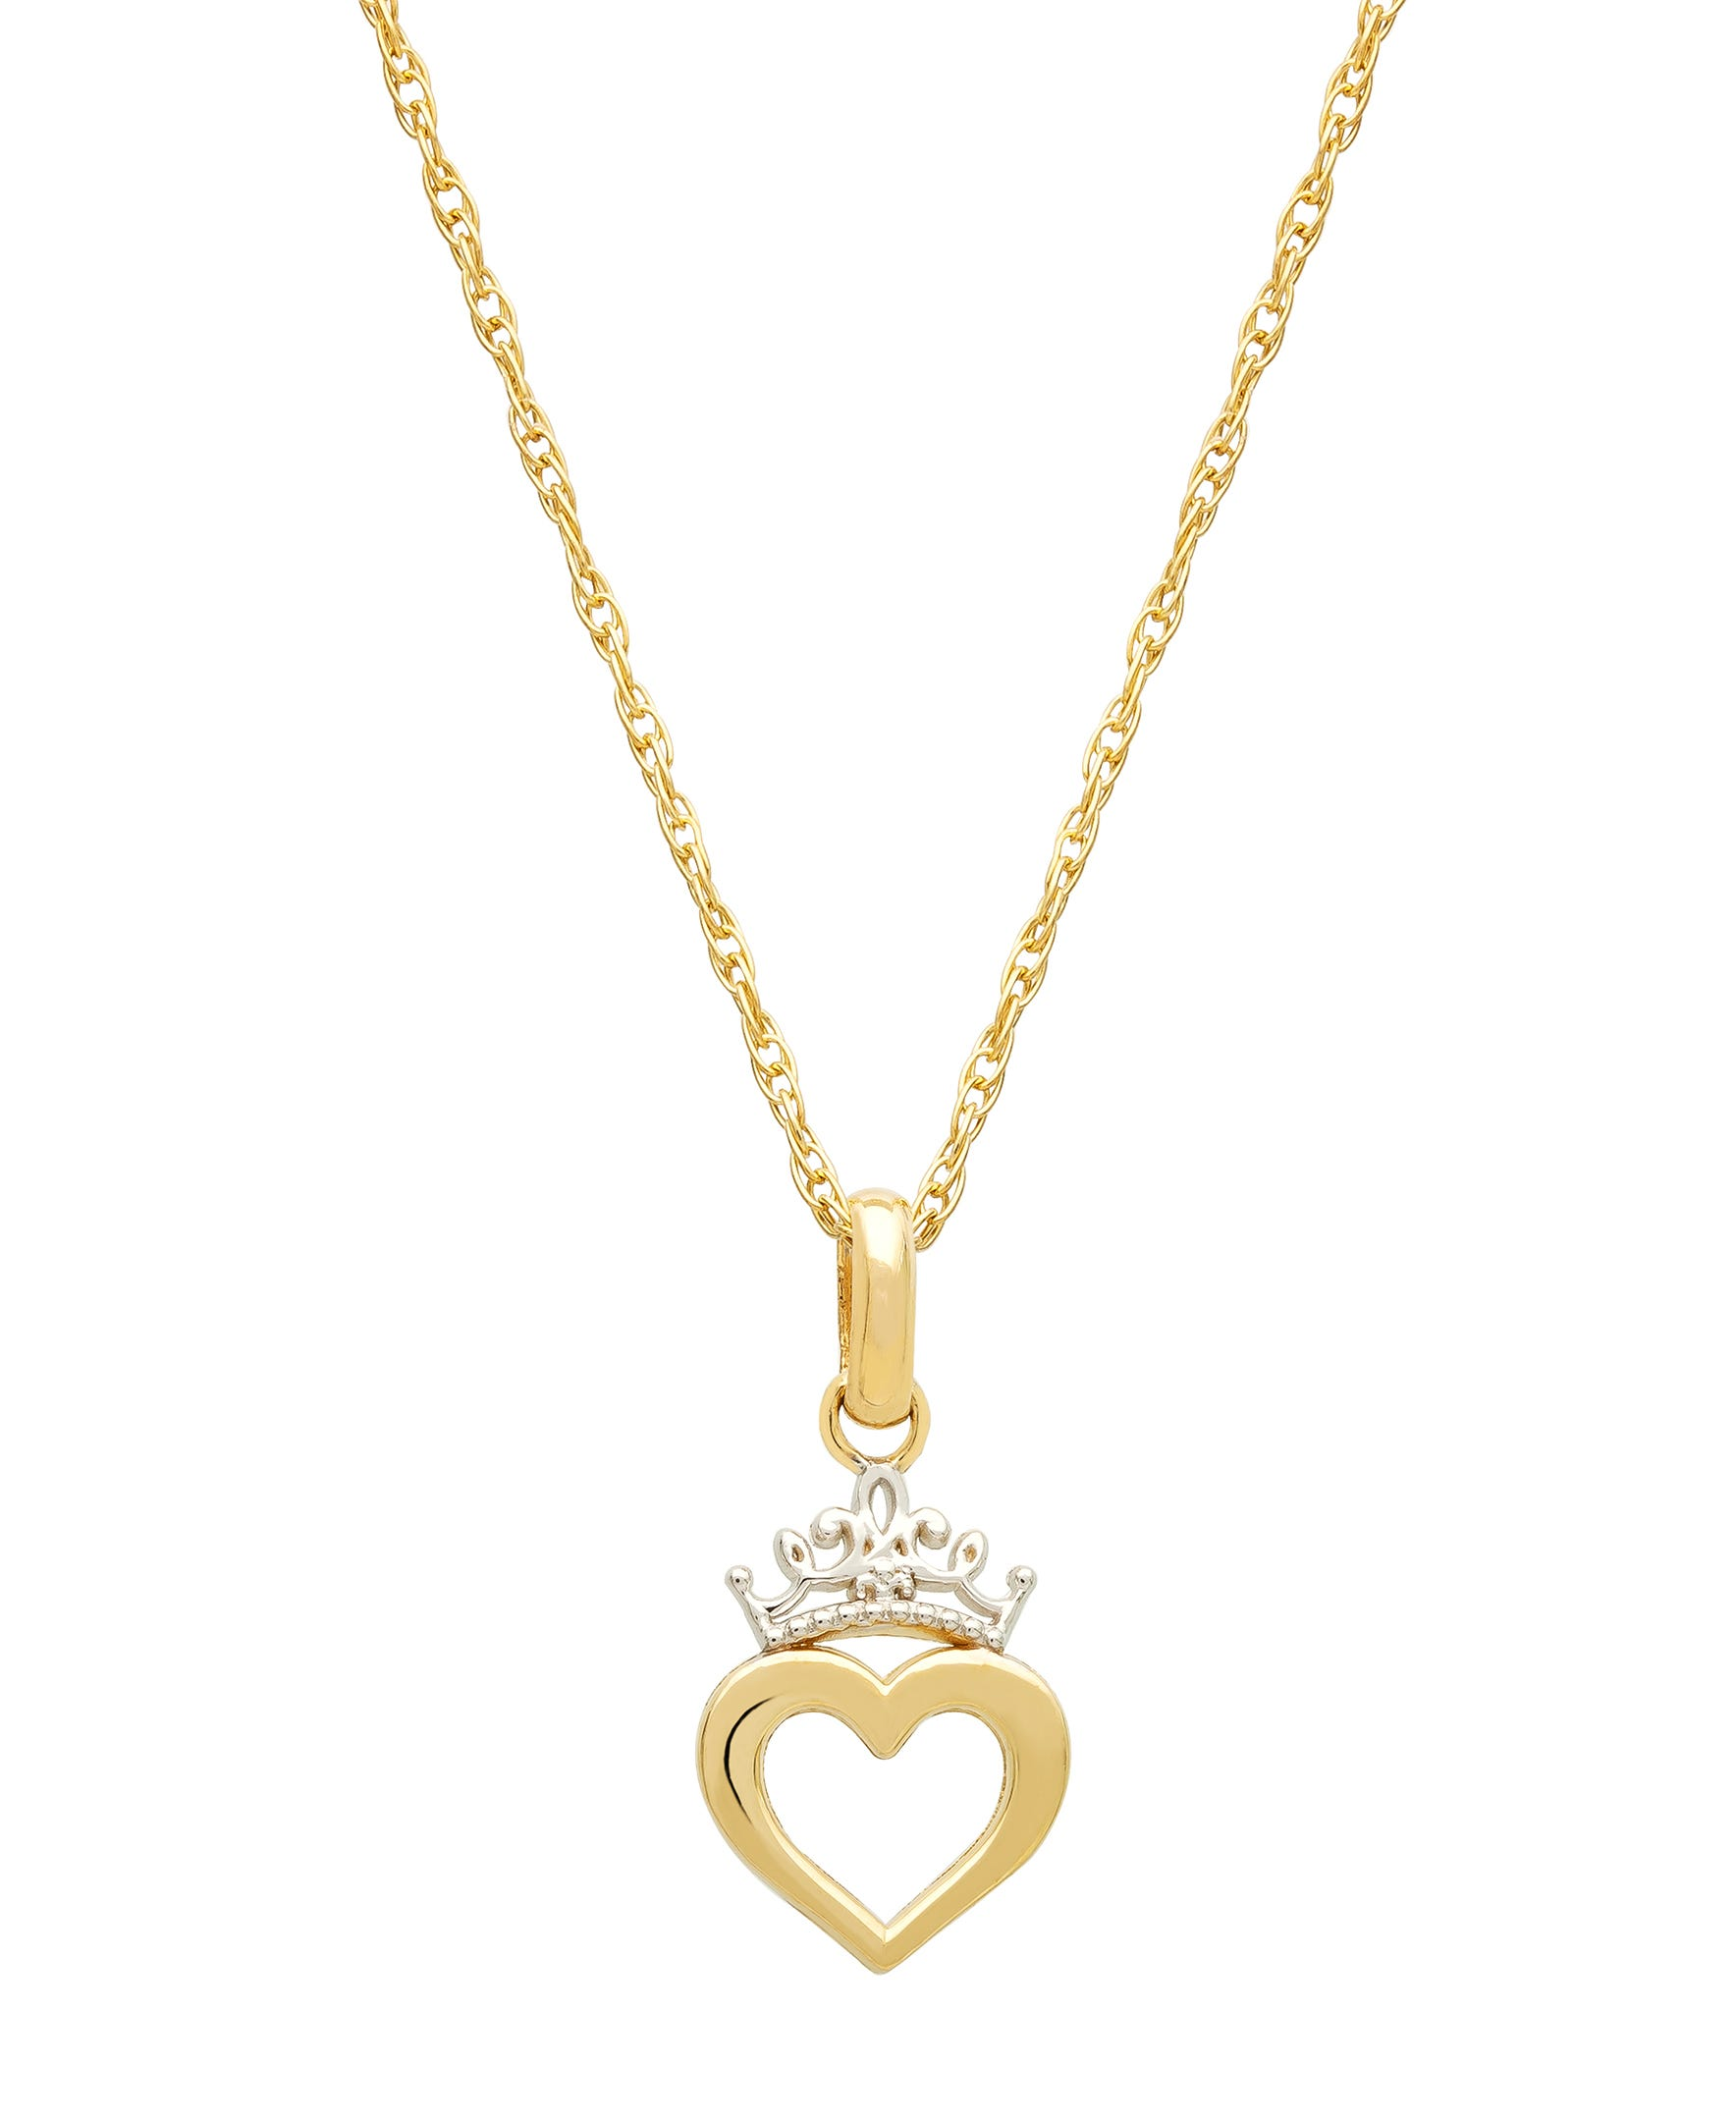 DISNEY© Princess Heart Pendant in 10k Yellow Gold